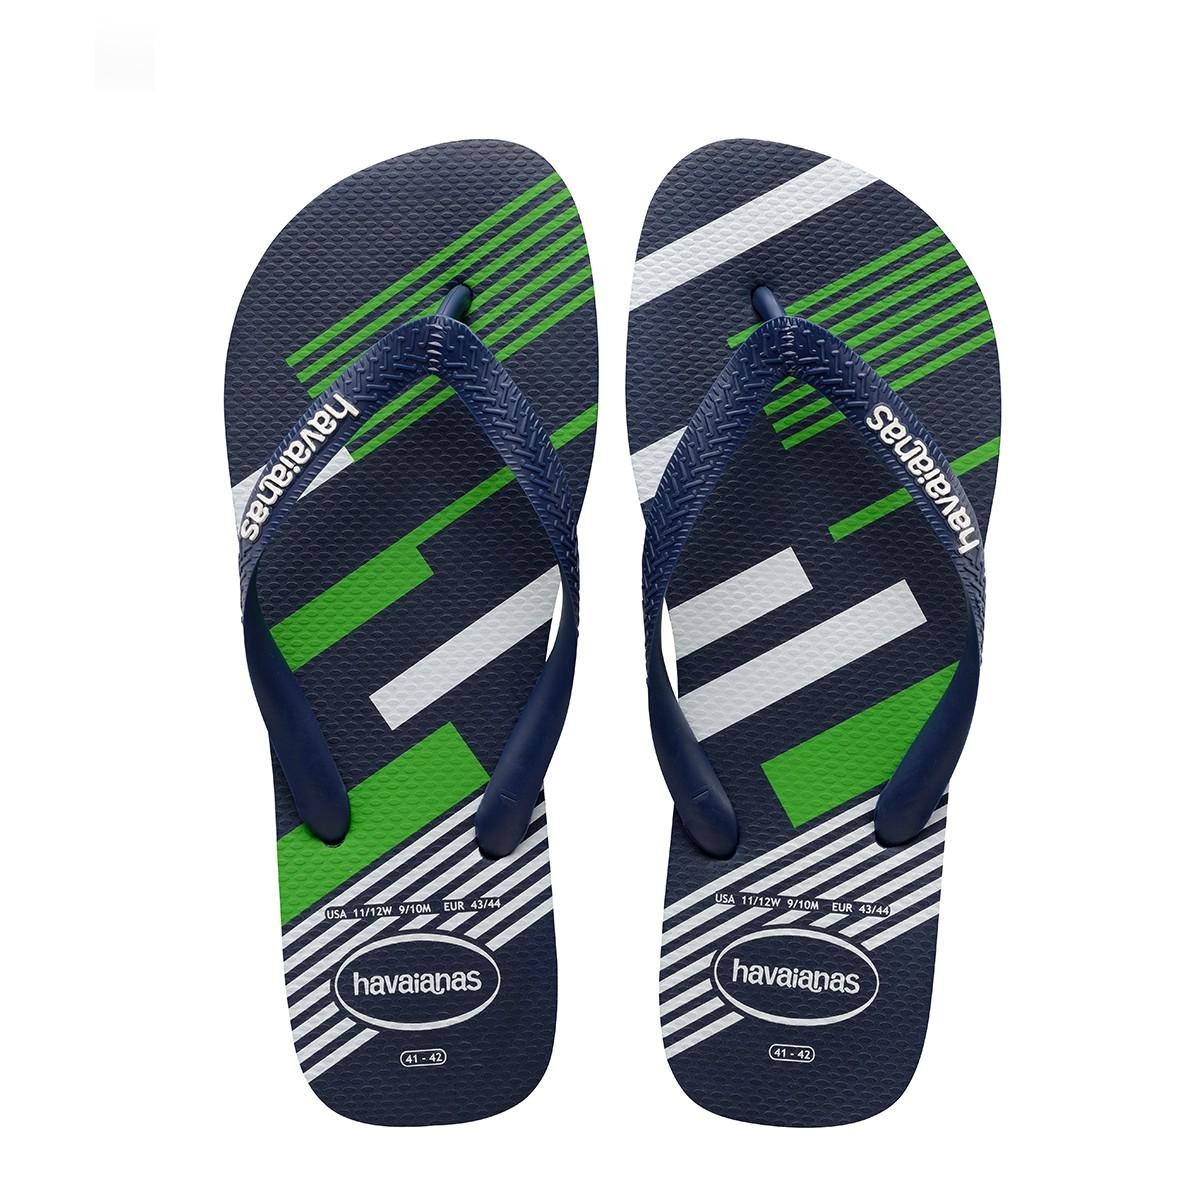 ab6ffb904 HAVAIANAS TOP TREND SANDAL NAVY BLUE WHITE.  havaianas  shoes ...